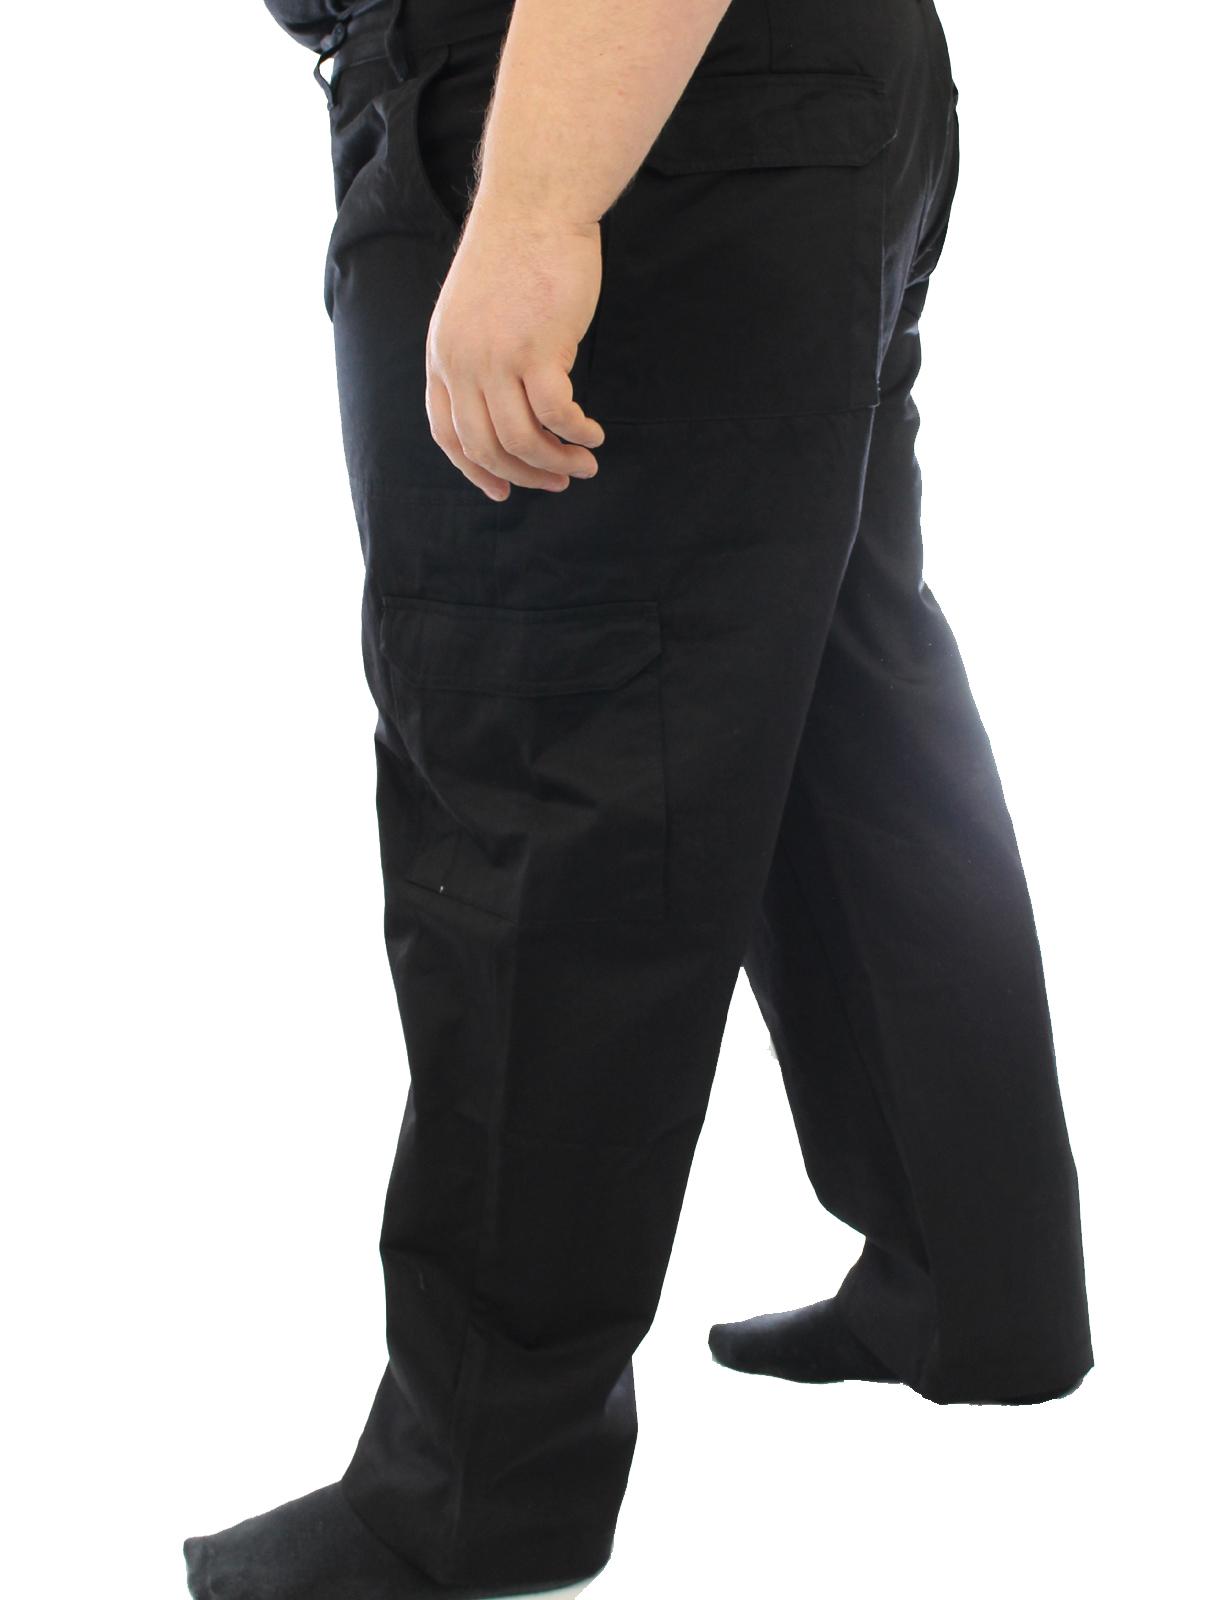 "Ed Baxter Victory - Tall Heavy Duty Cargo Combat Trousers - Black - 34"" Waist 38"" Leg"